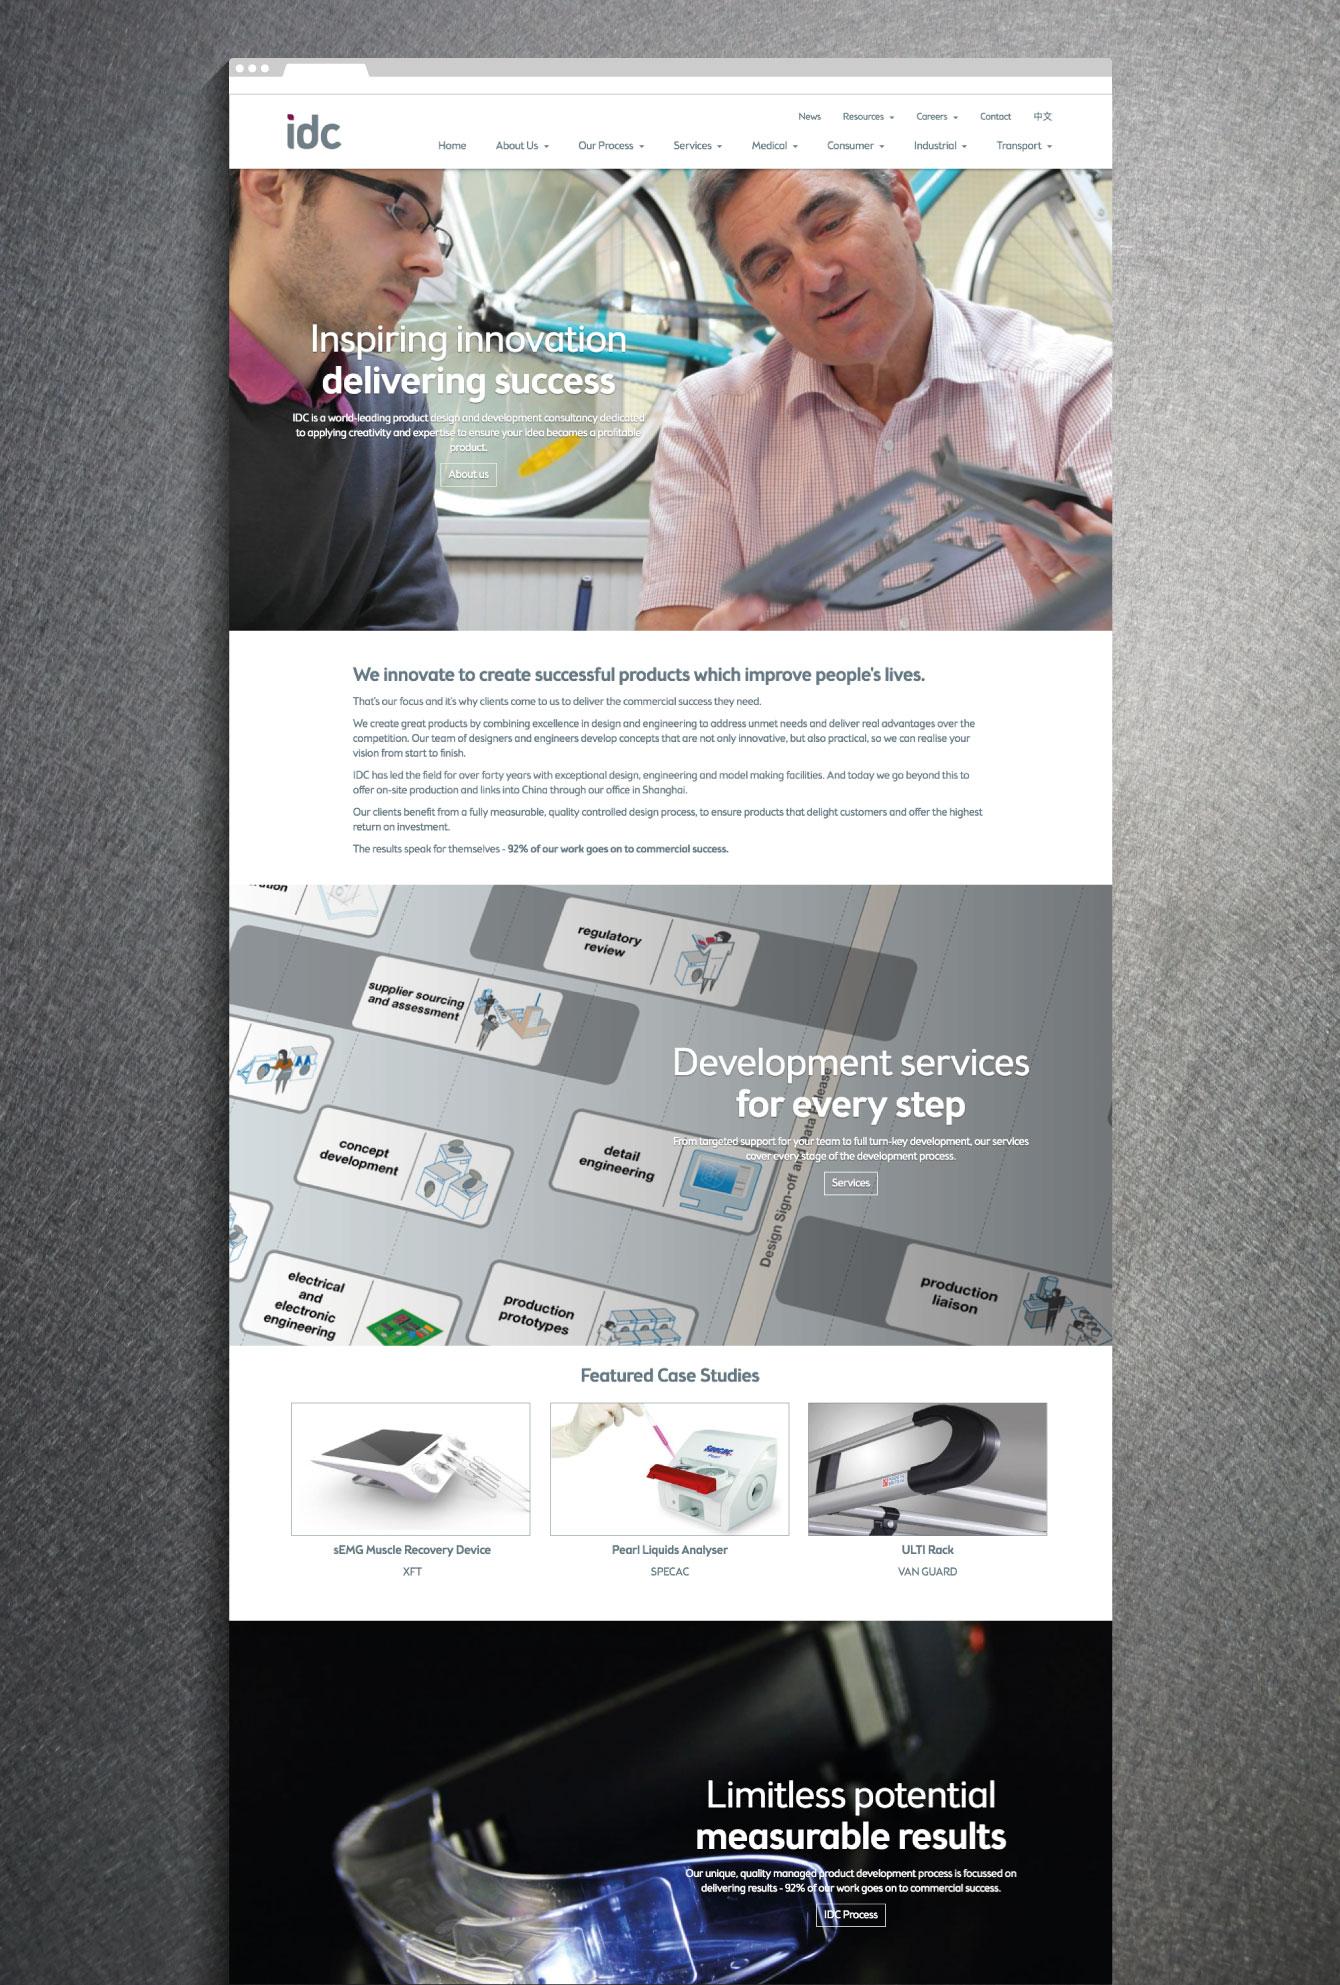 IDC website homepage - desktop